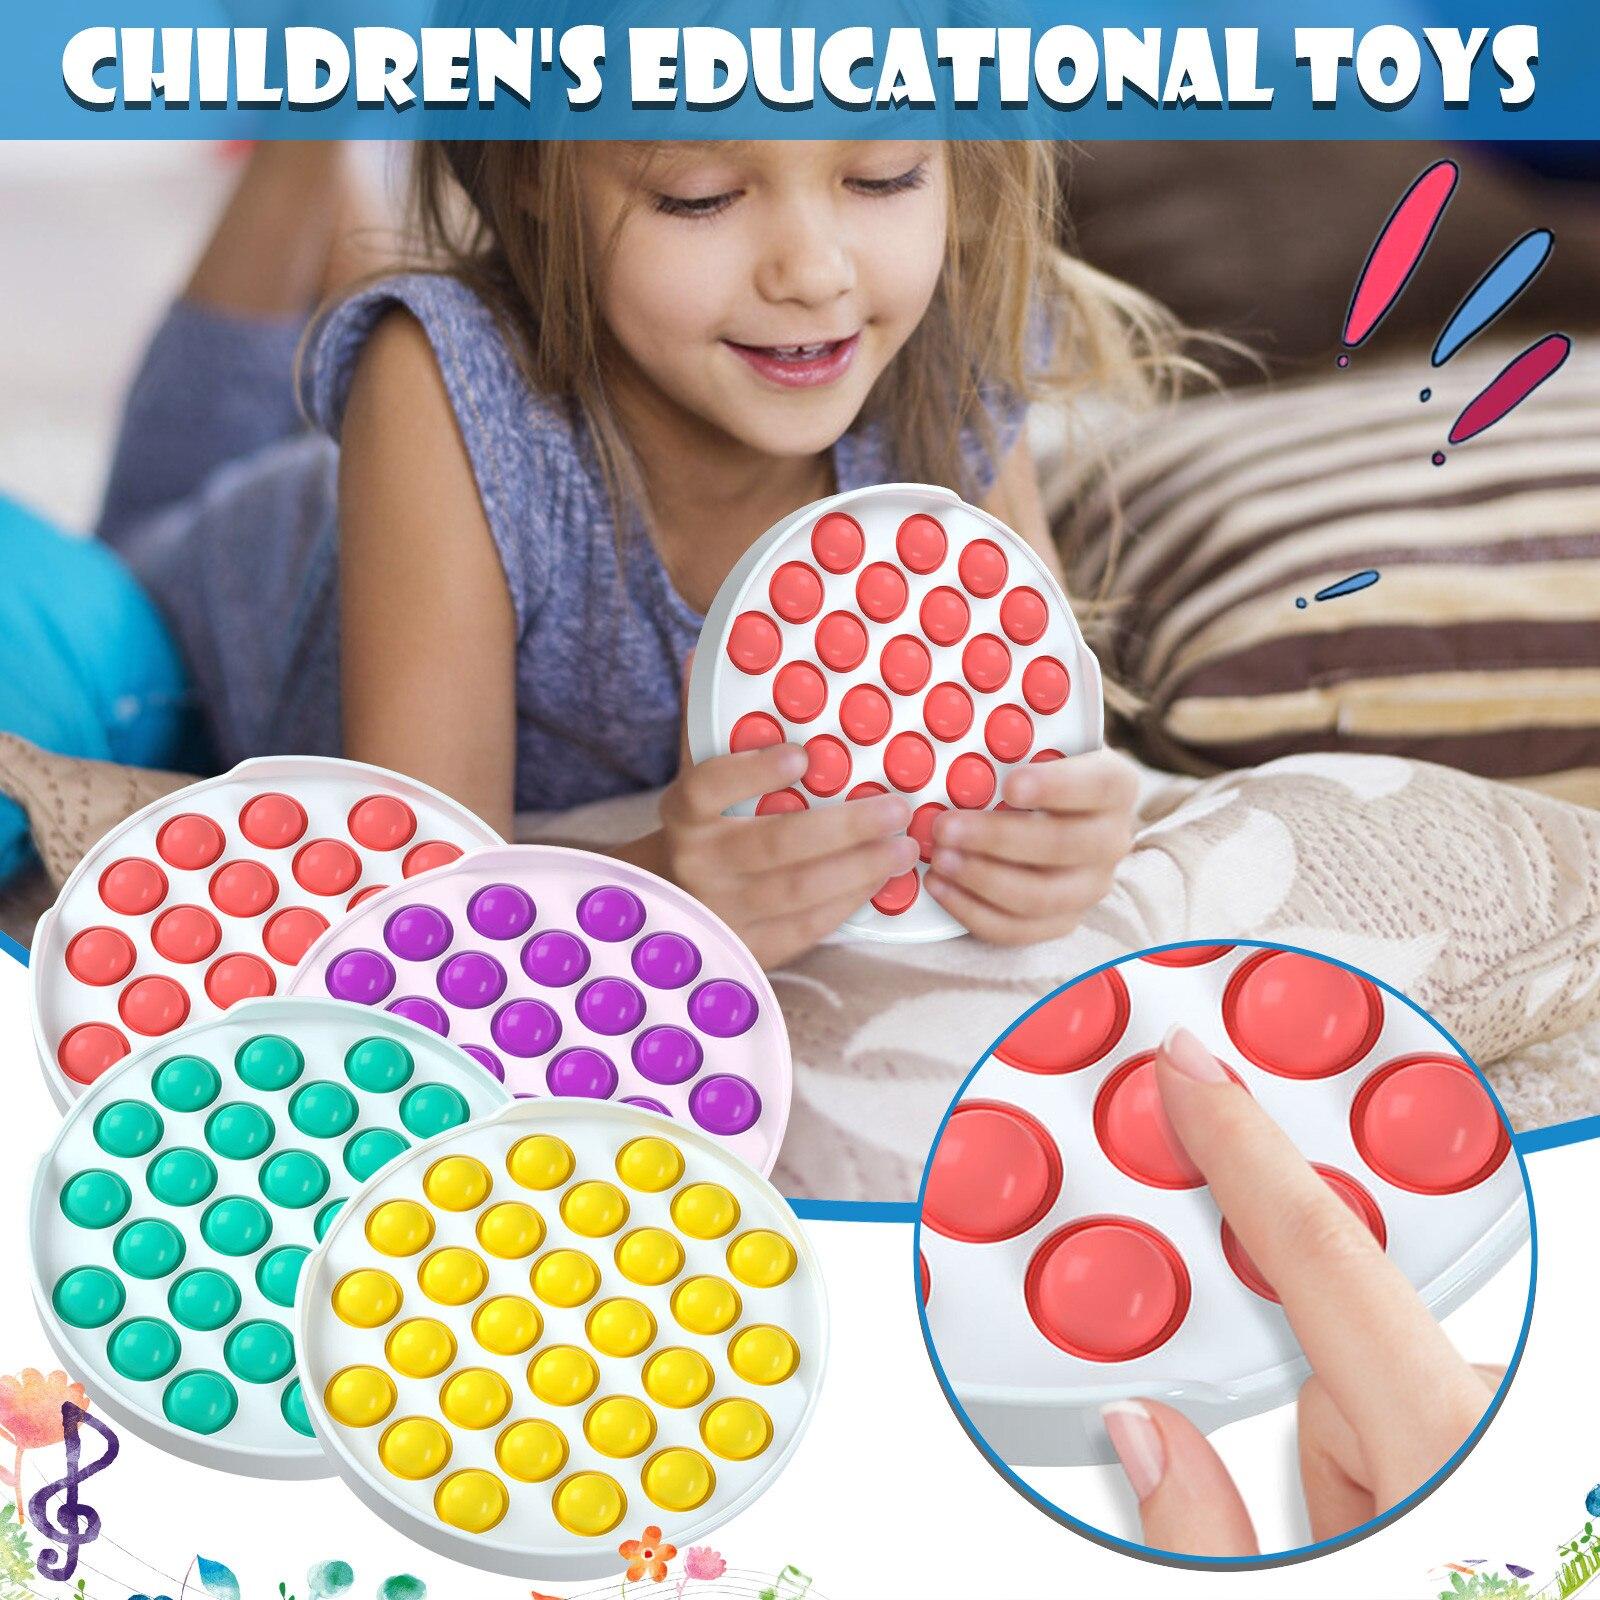 Toys Autism Anti-Stress Rainbow Bubble-Sensory Pops Squishy Fidget-Push Pop-It Colorful img2